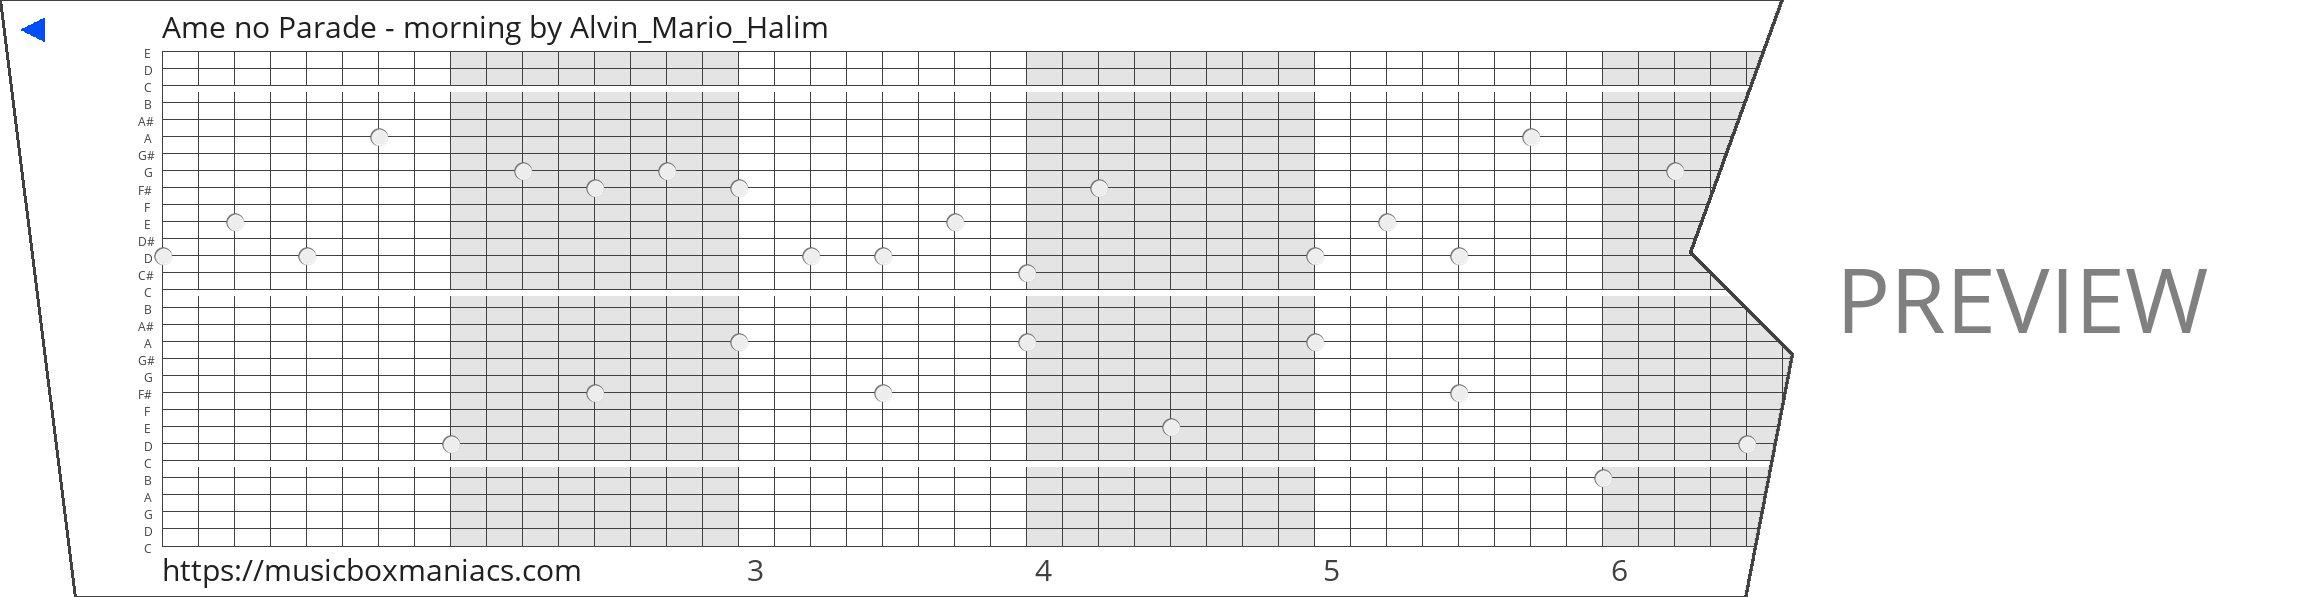 Ame no Parade - morning 30 note music box paper strip